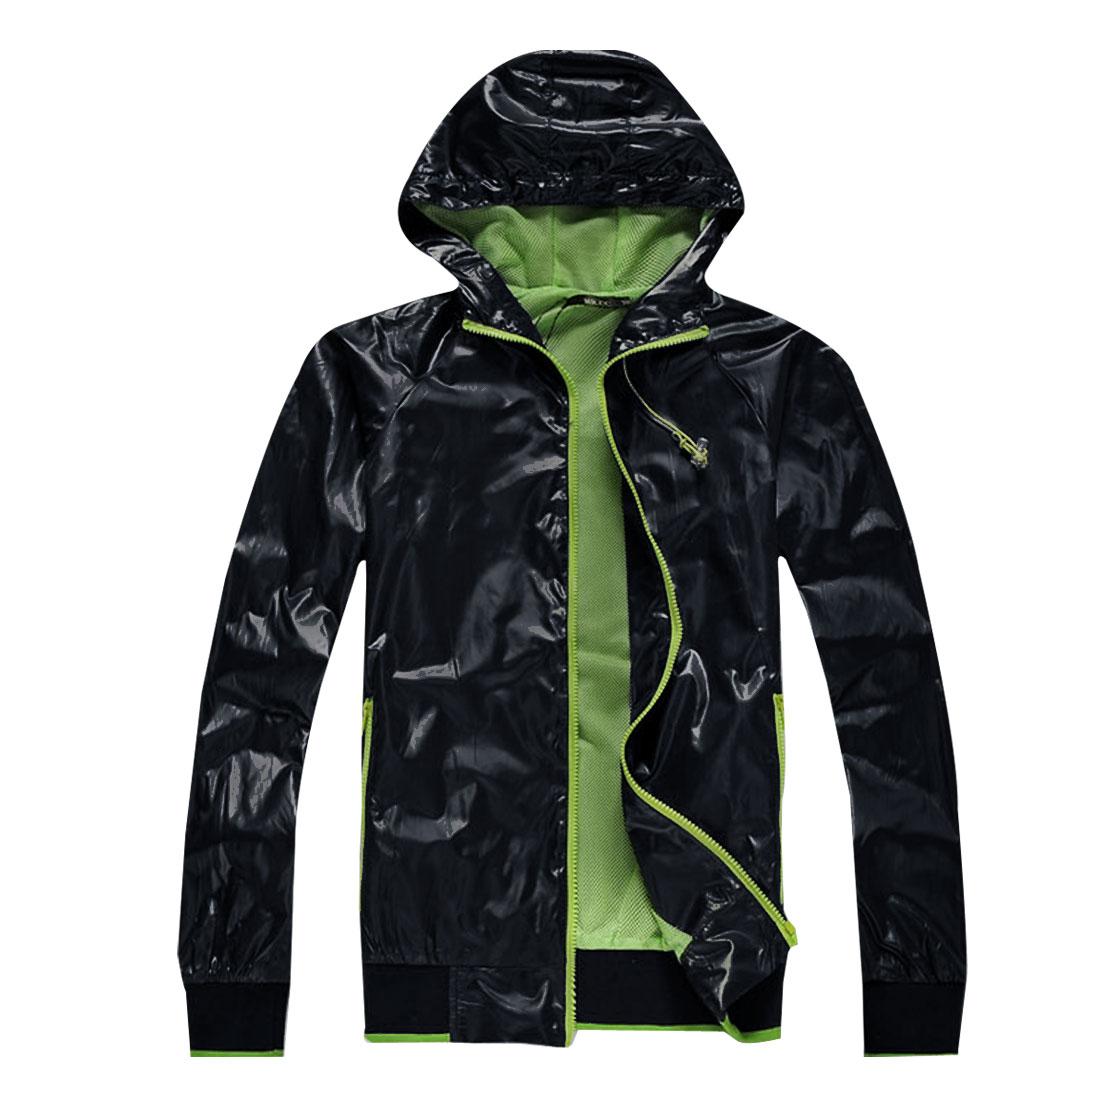 Mens Dark Blue Long Sleeve Waterproof Breathable Climbling Jacket L